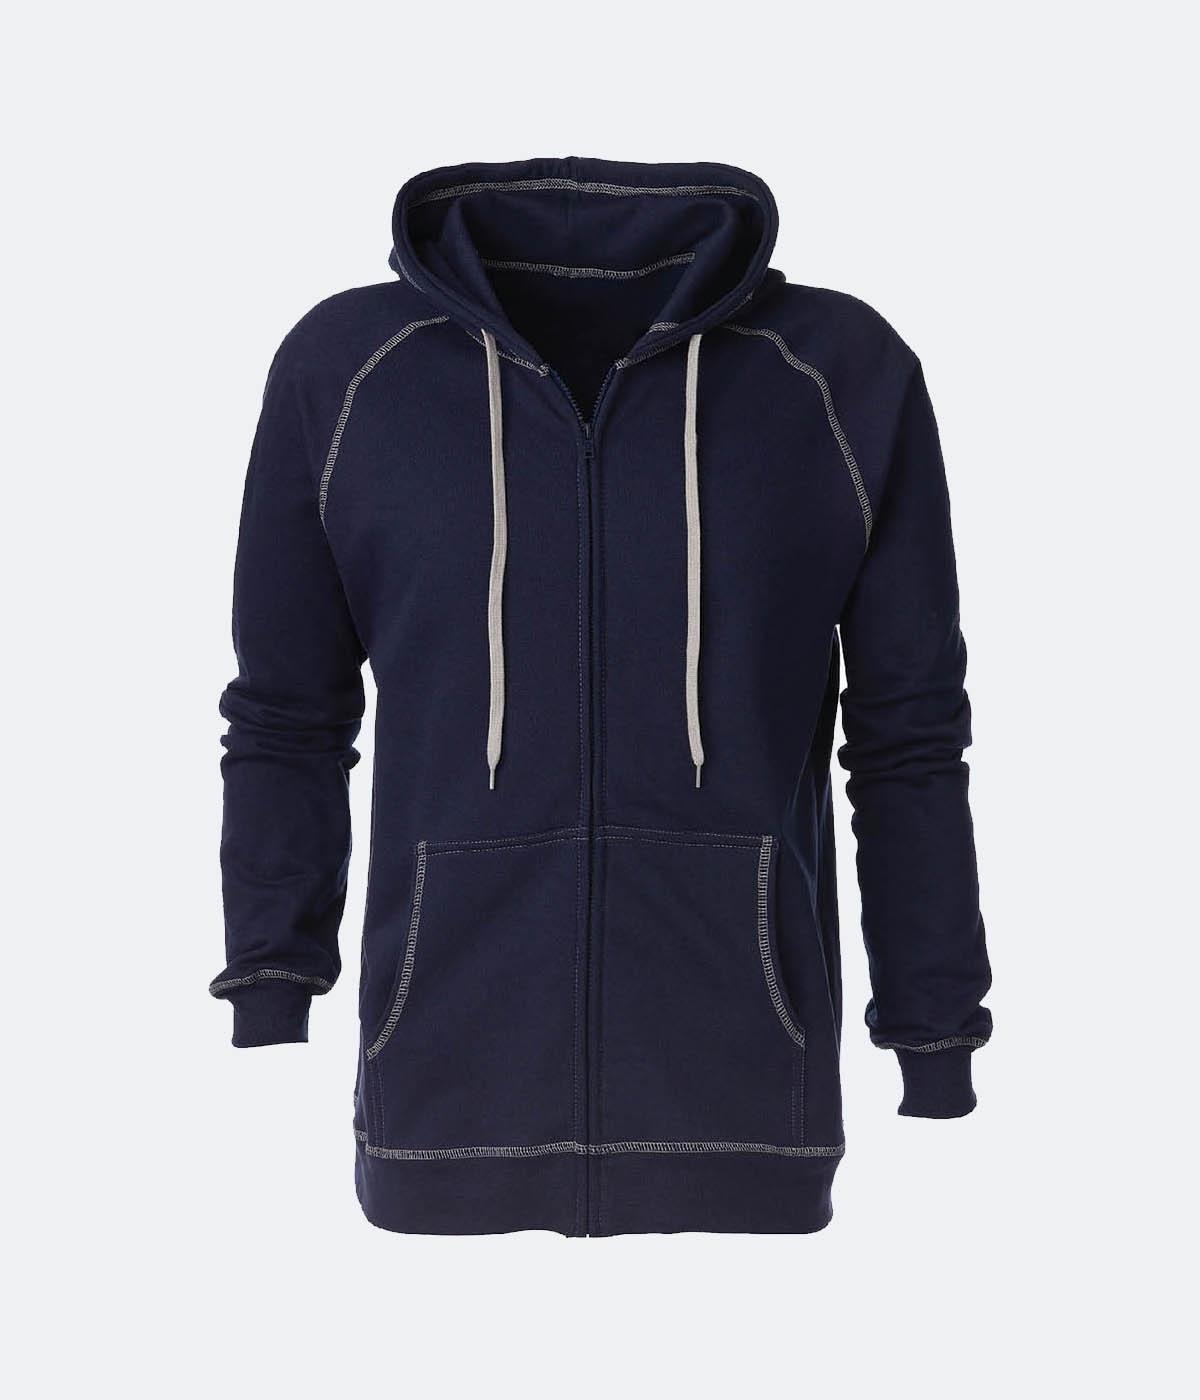 jackets supplier, exporter, manufacturer, factory